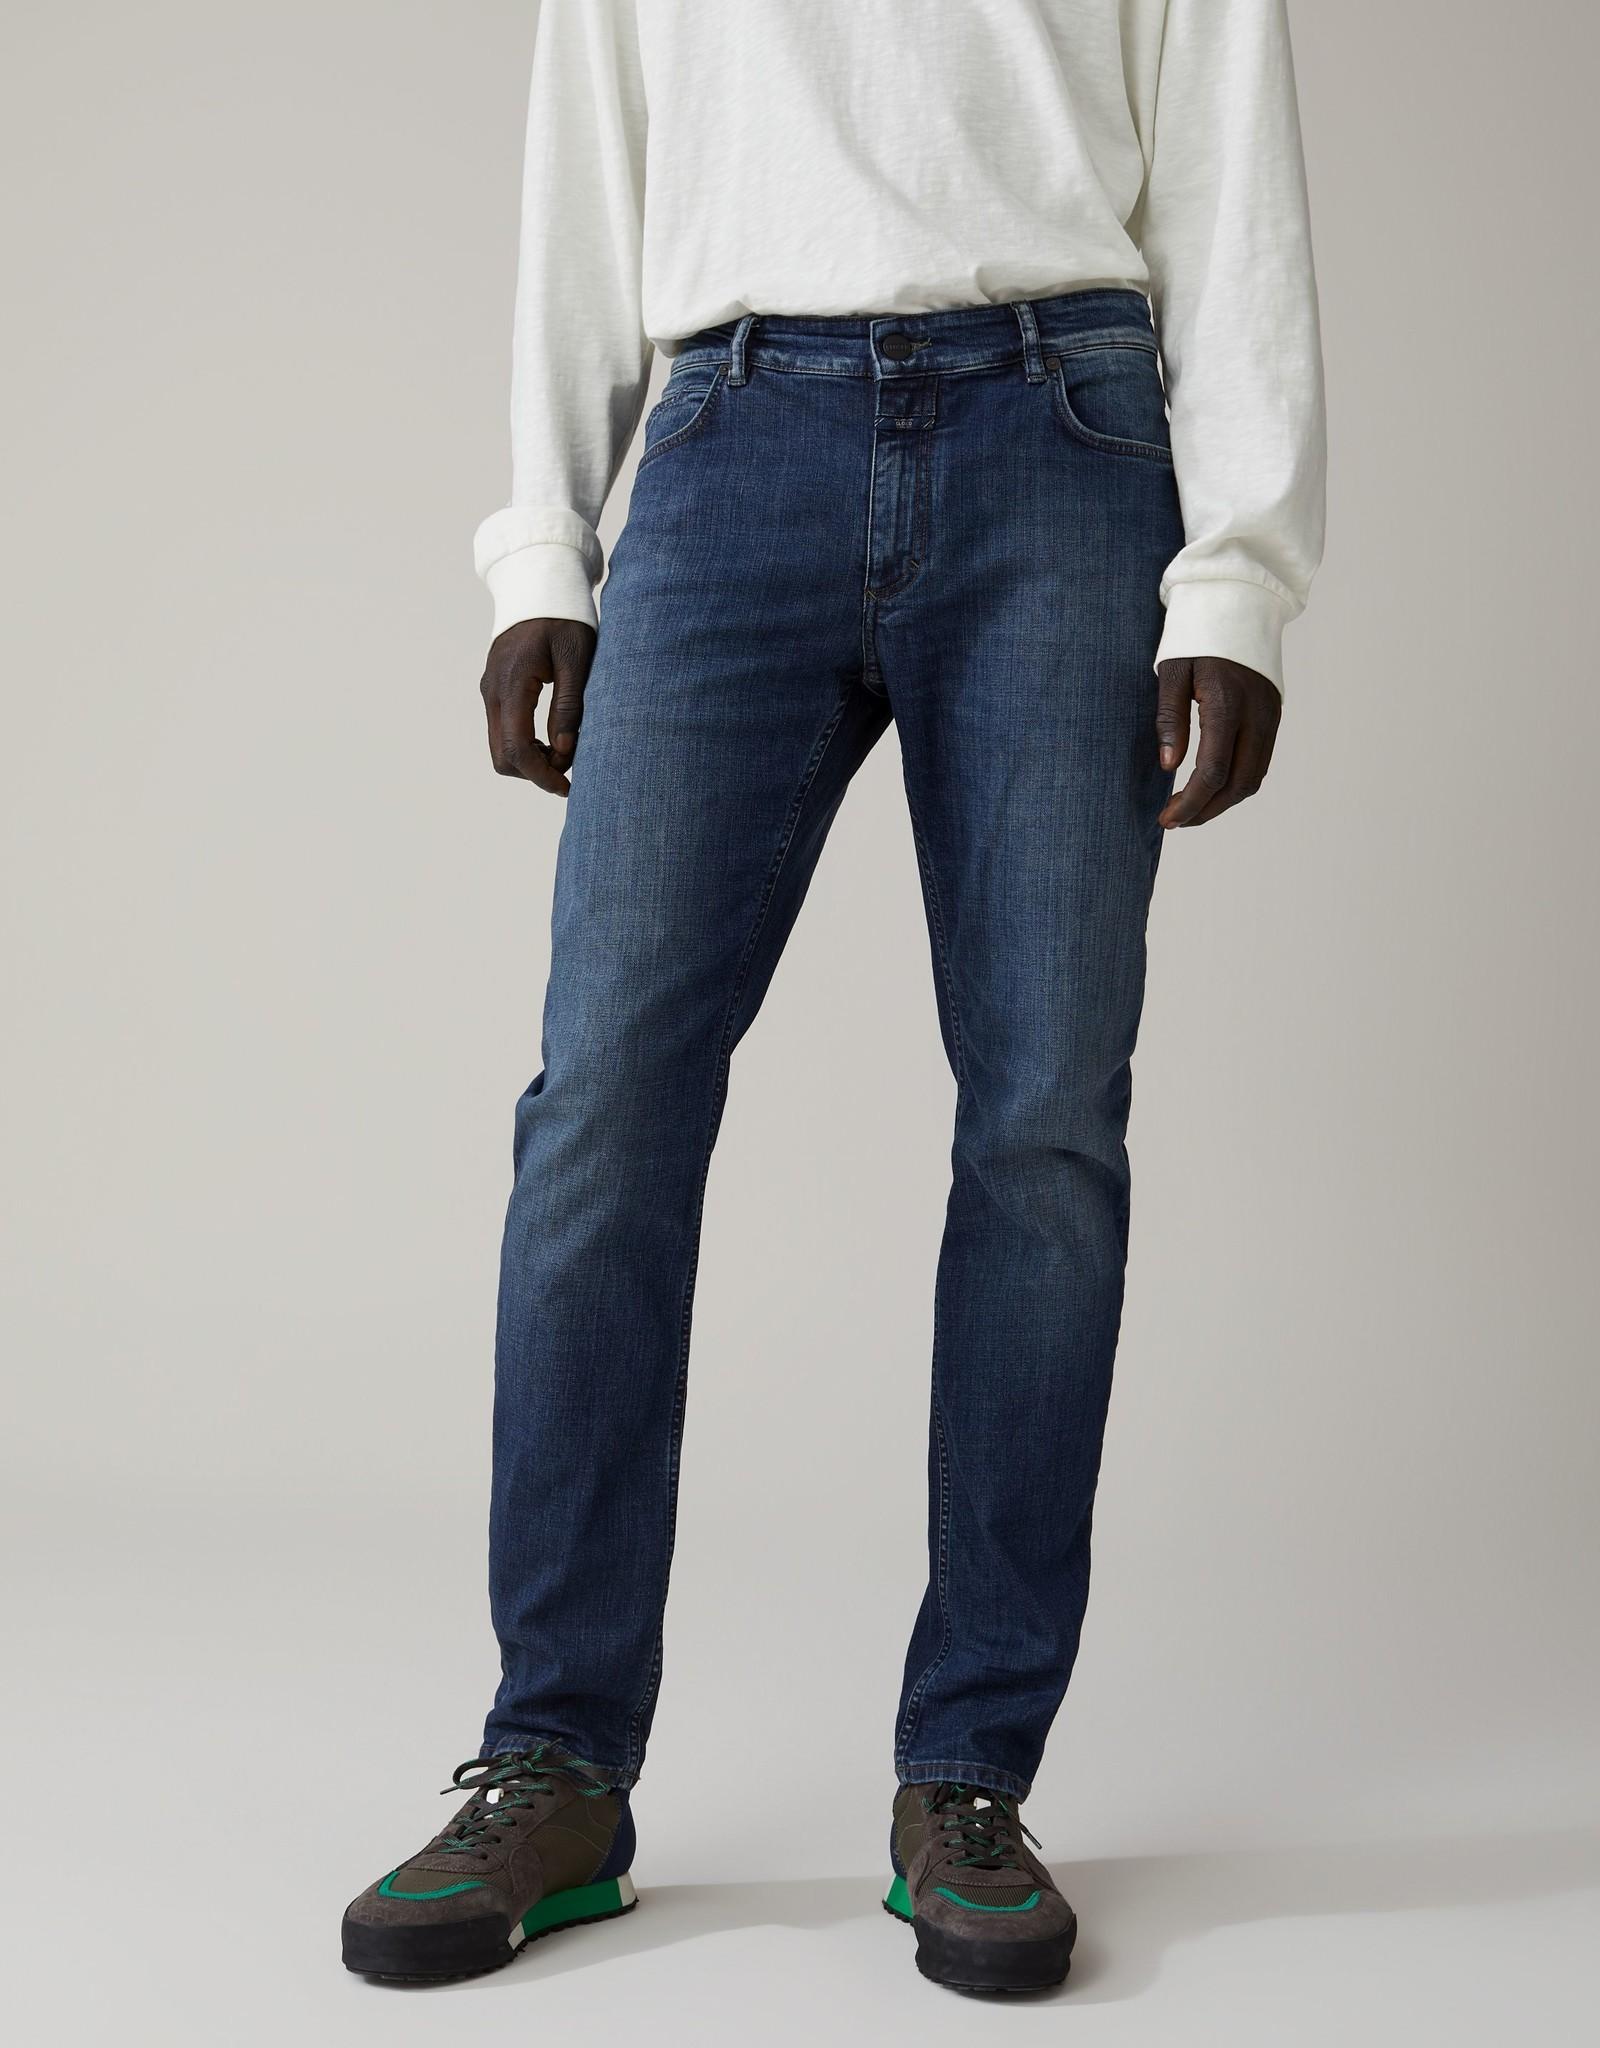 Closed Jeans Slim Fit